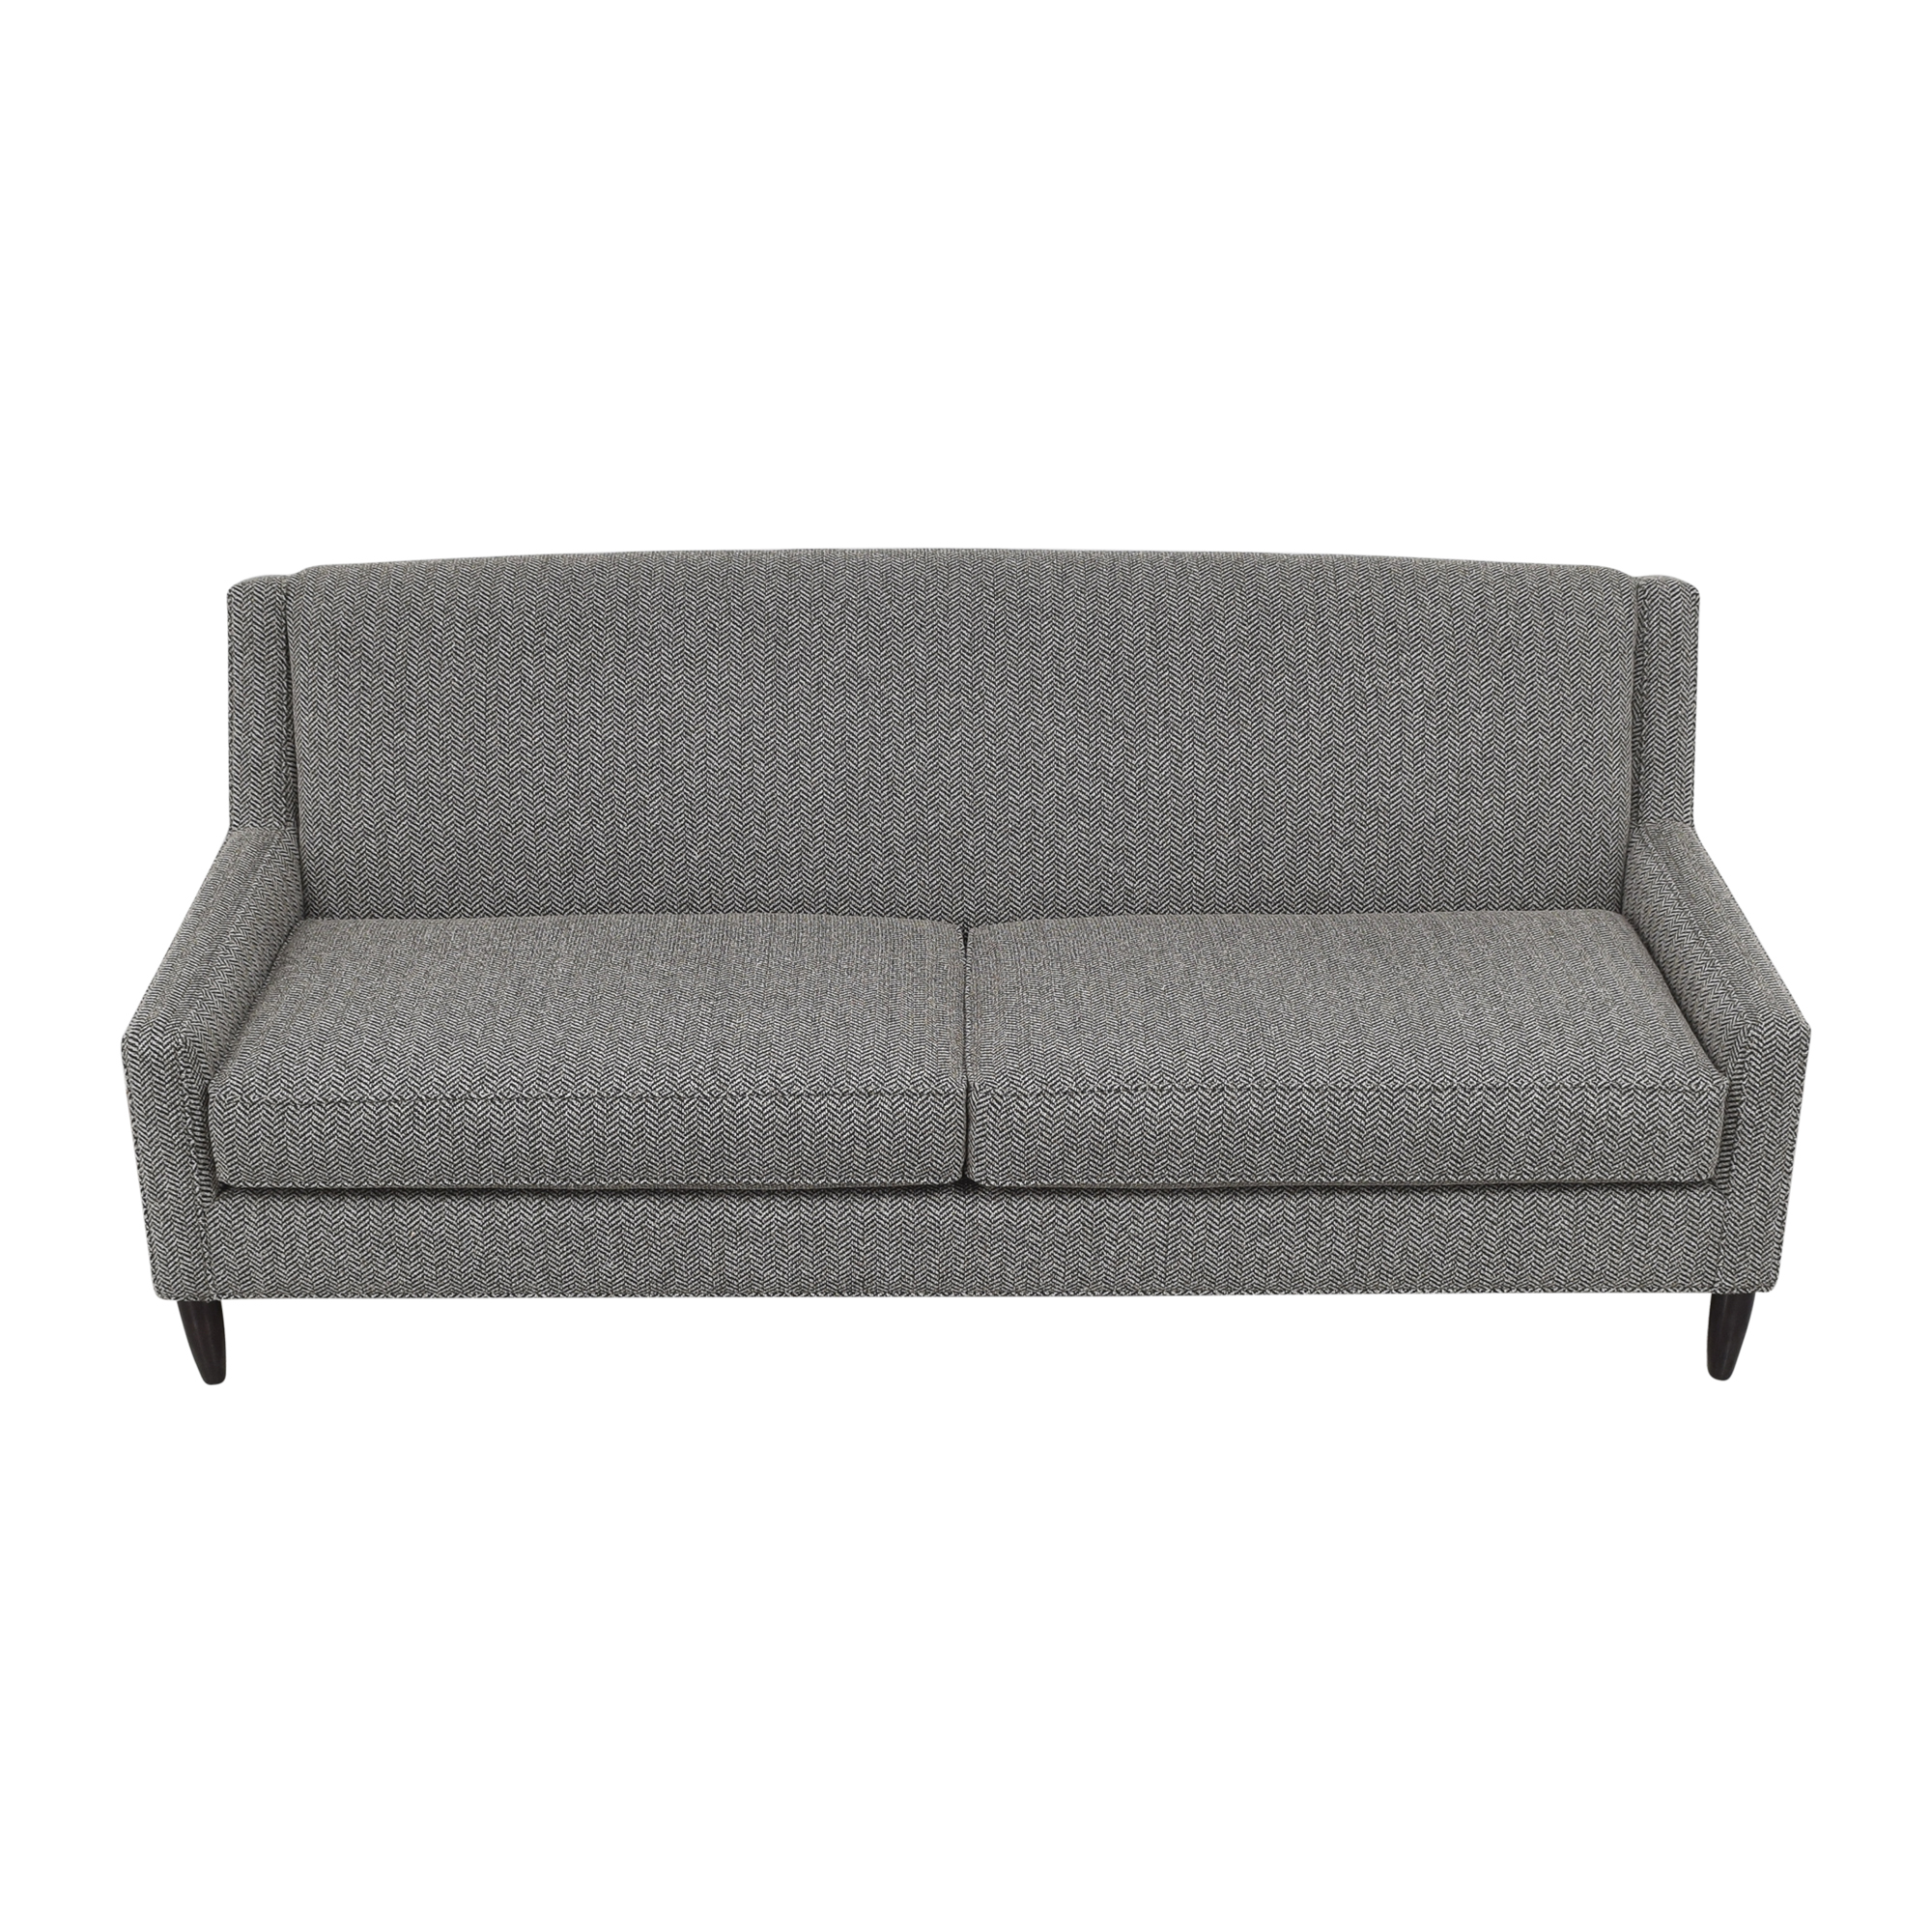 Room & Board Braden Sofa / Classic Sofas